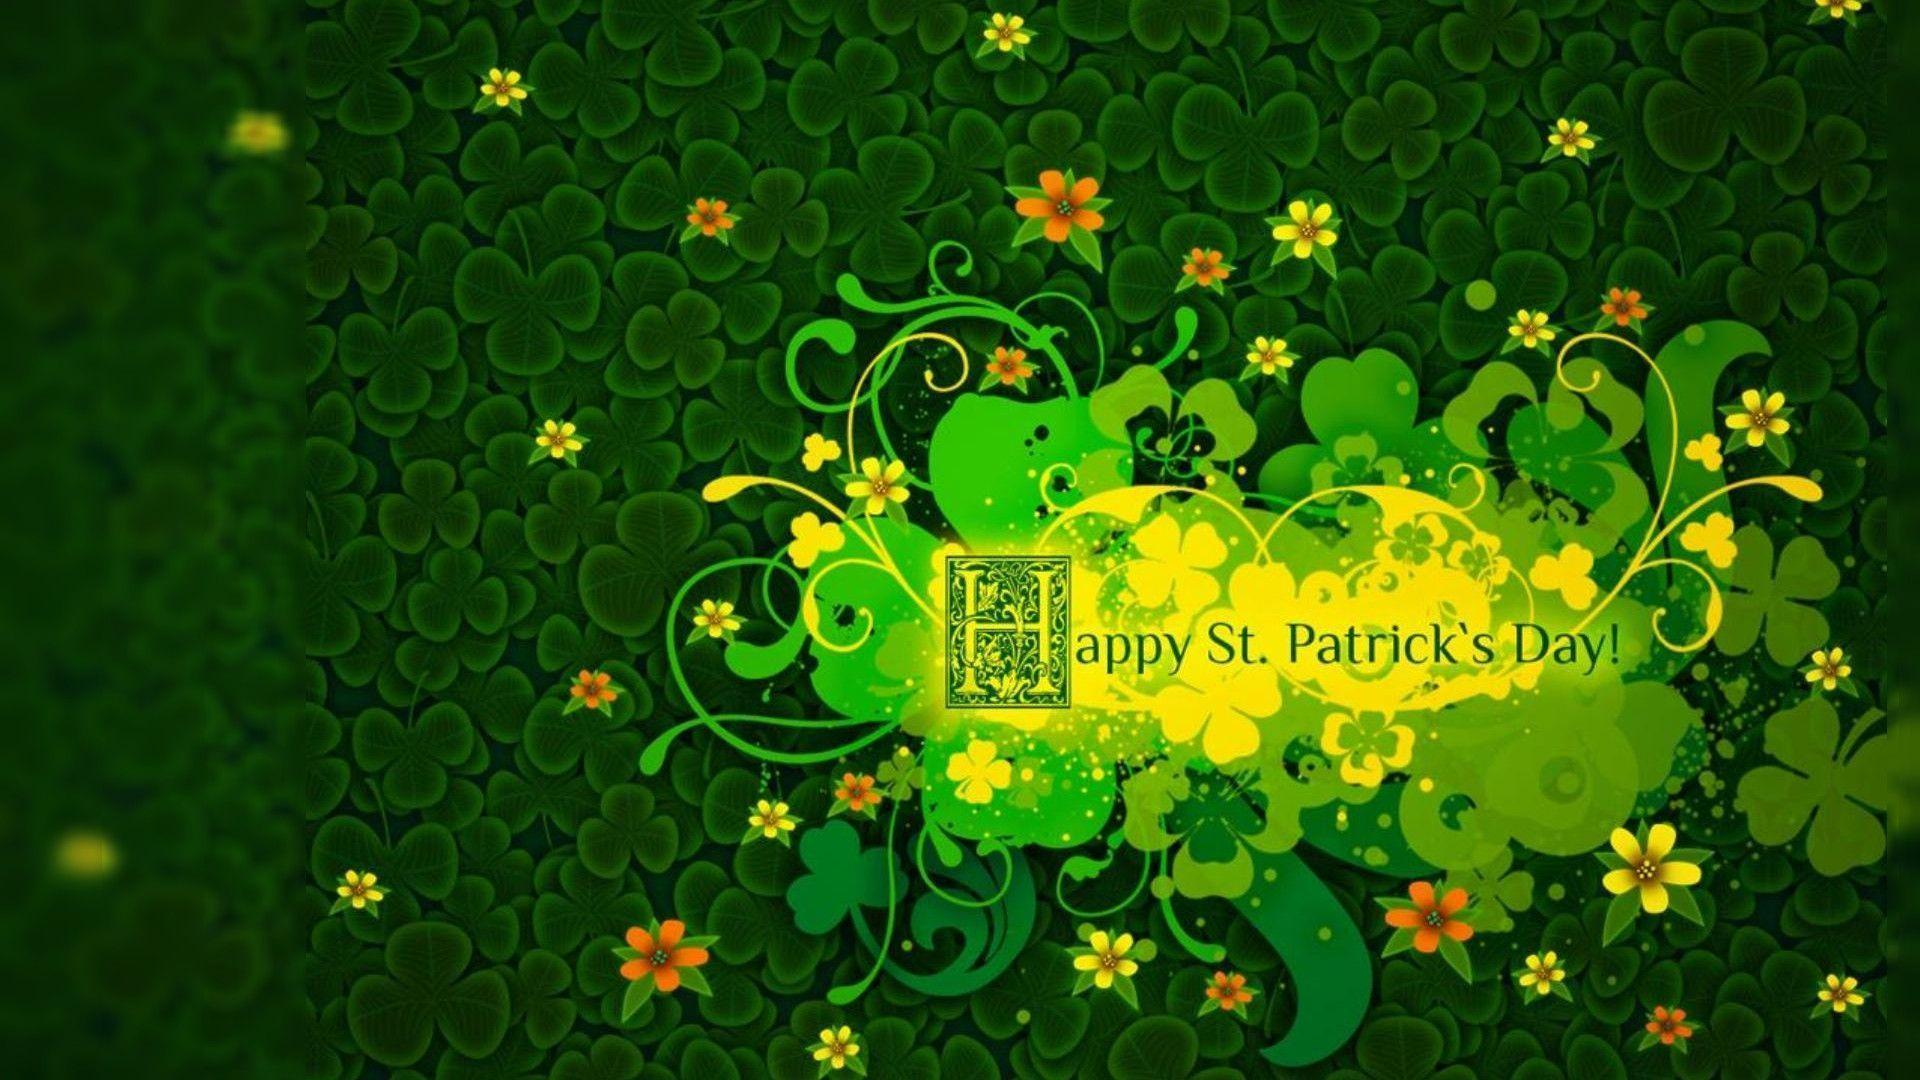 Free St Patricks Day Desktop Wallpapers Wallpaper Cave